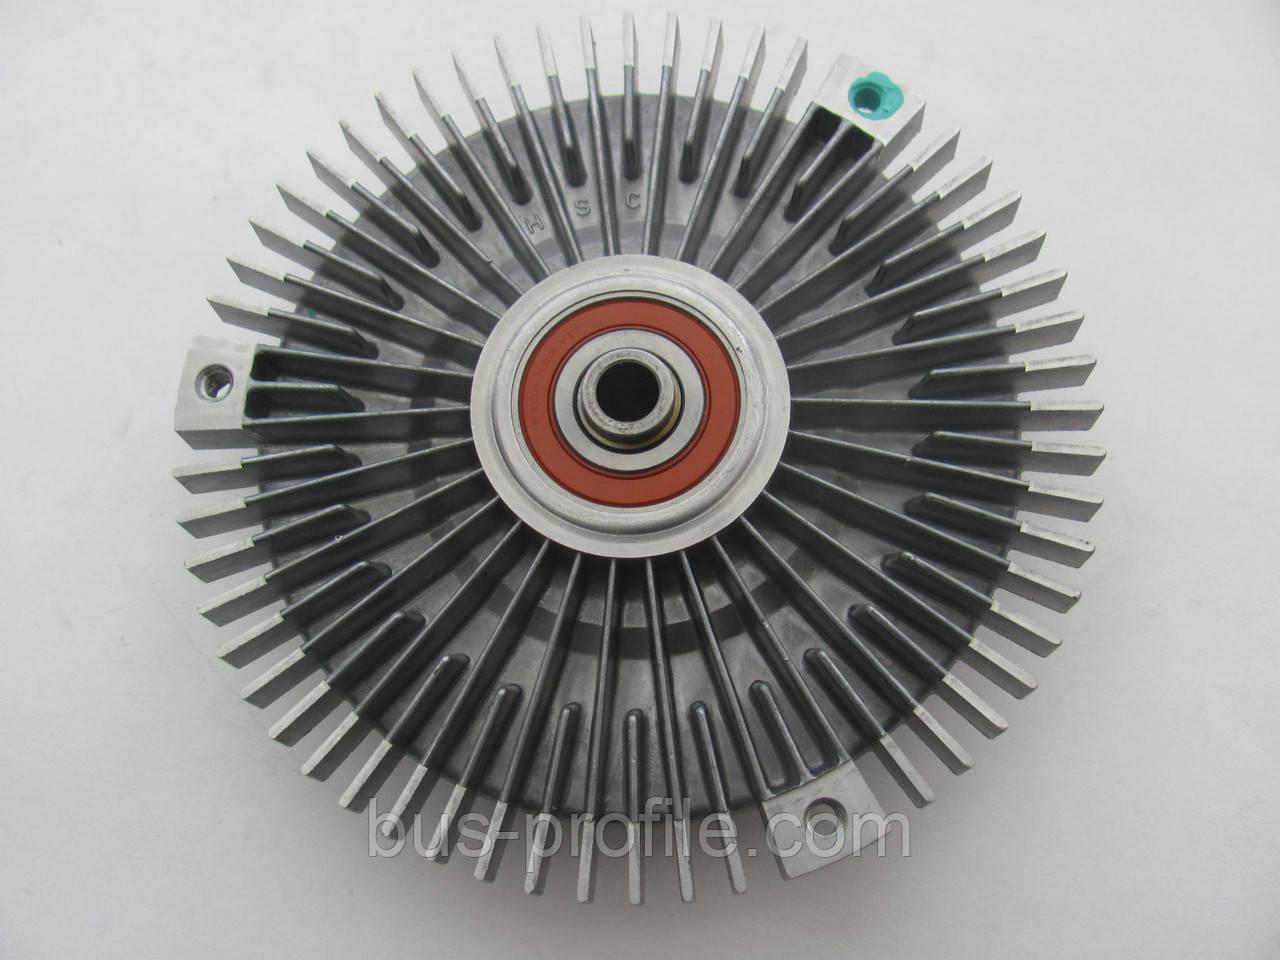 Муфта вентилятора на MB Sprinter 2.2, 2.7 Cdi 2000-2006 — Rotweiss (Туреччина) — 0002005822